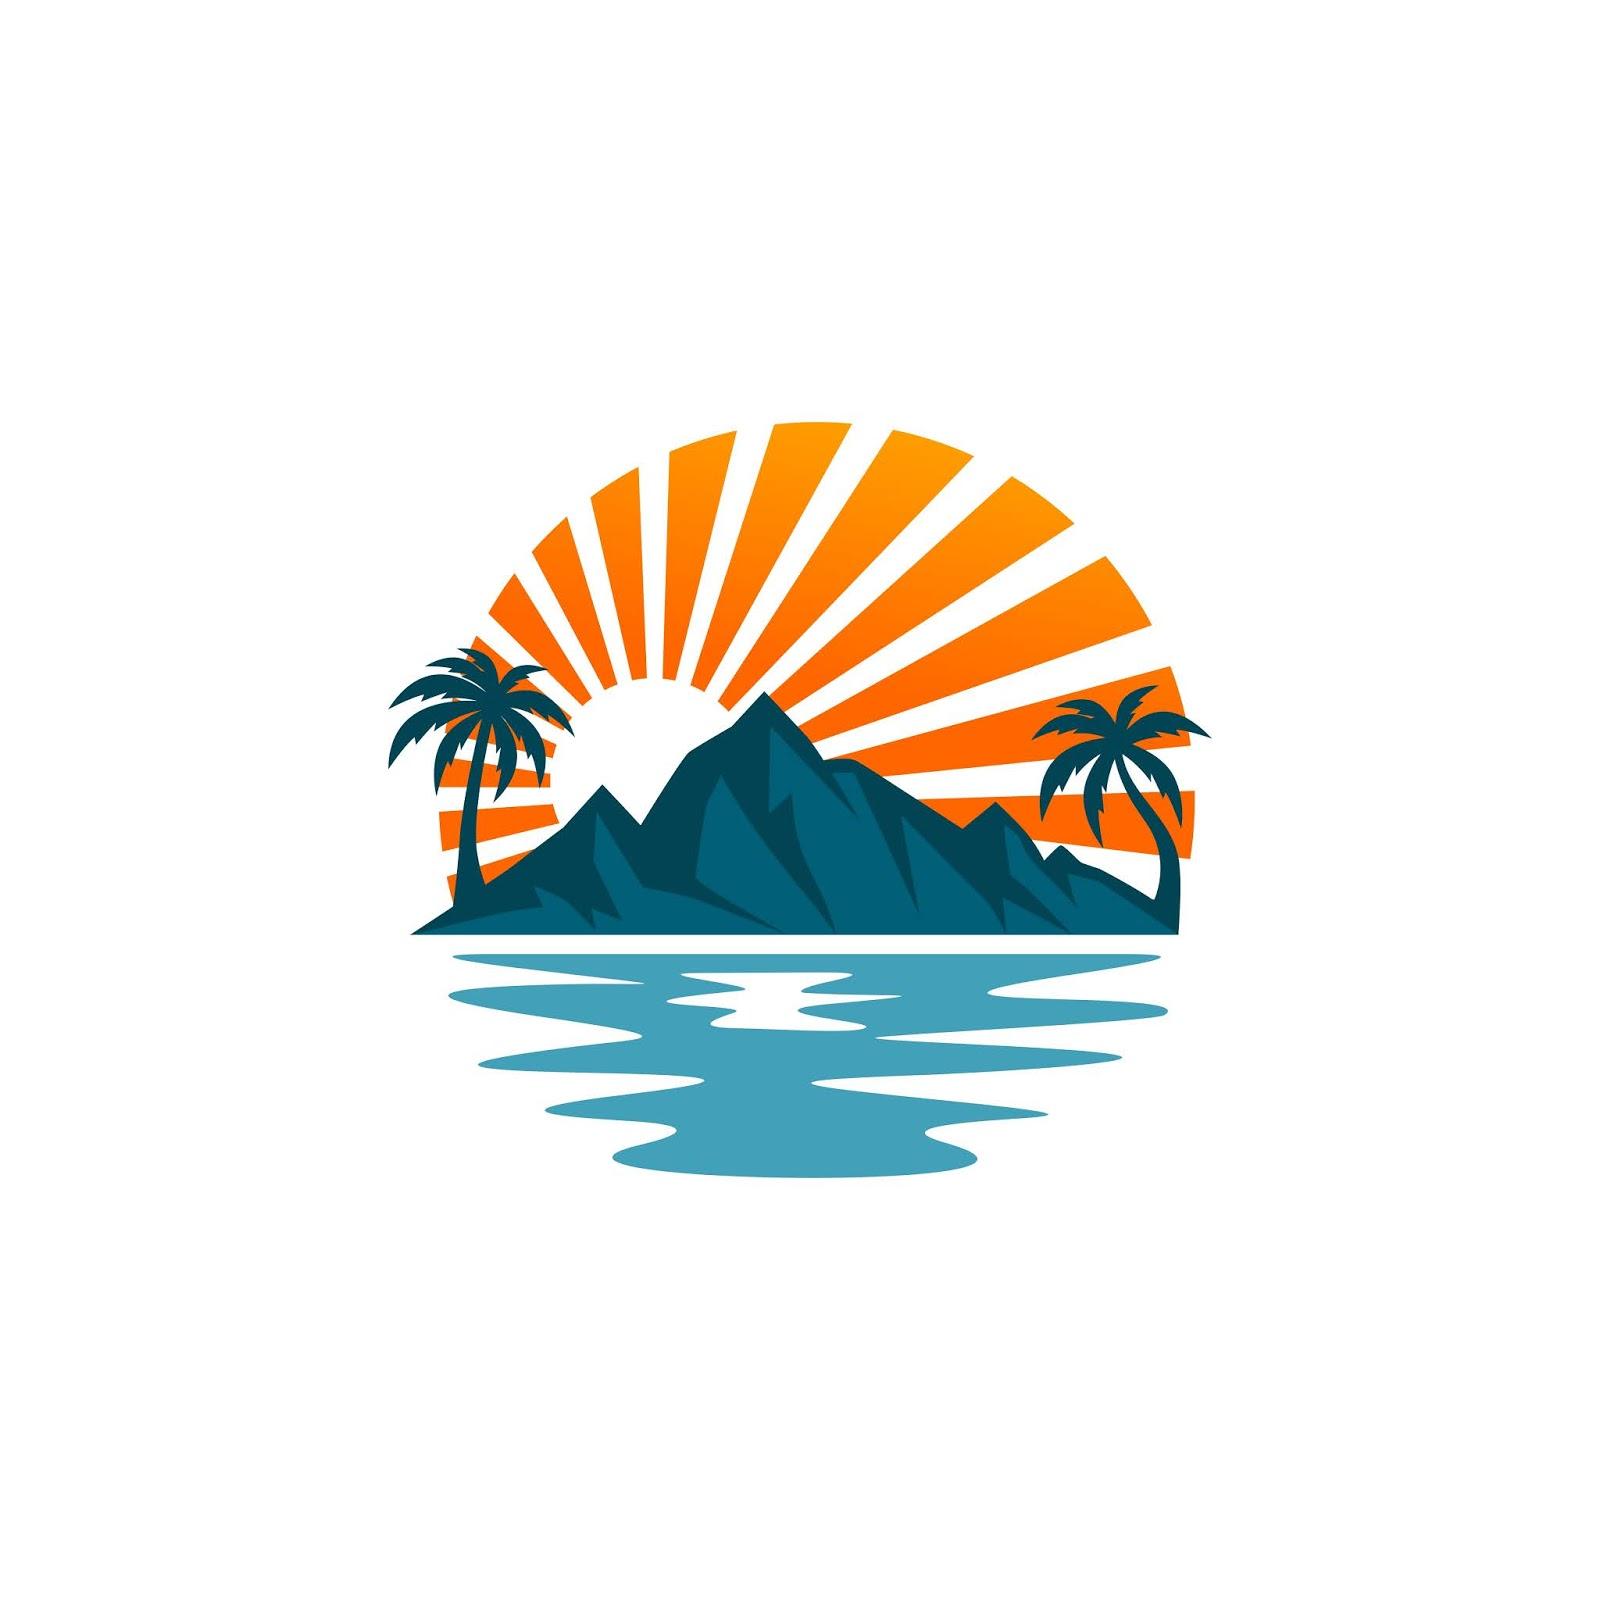 Beach Logo Vectors.jpg Free Download Vector CDR, AI, EPS and PNG Formats